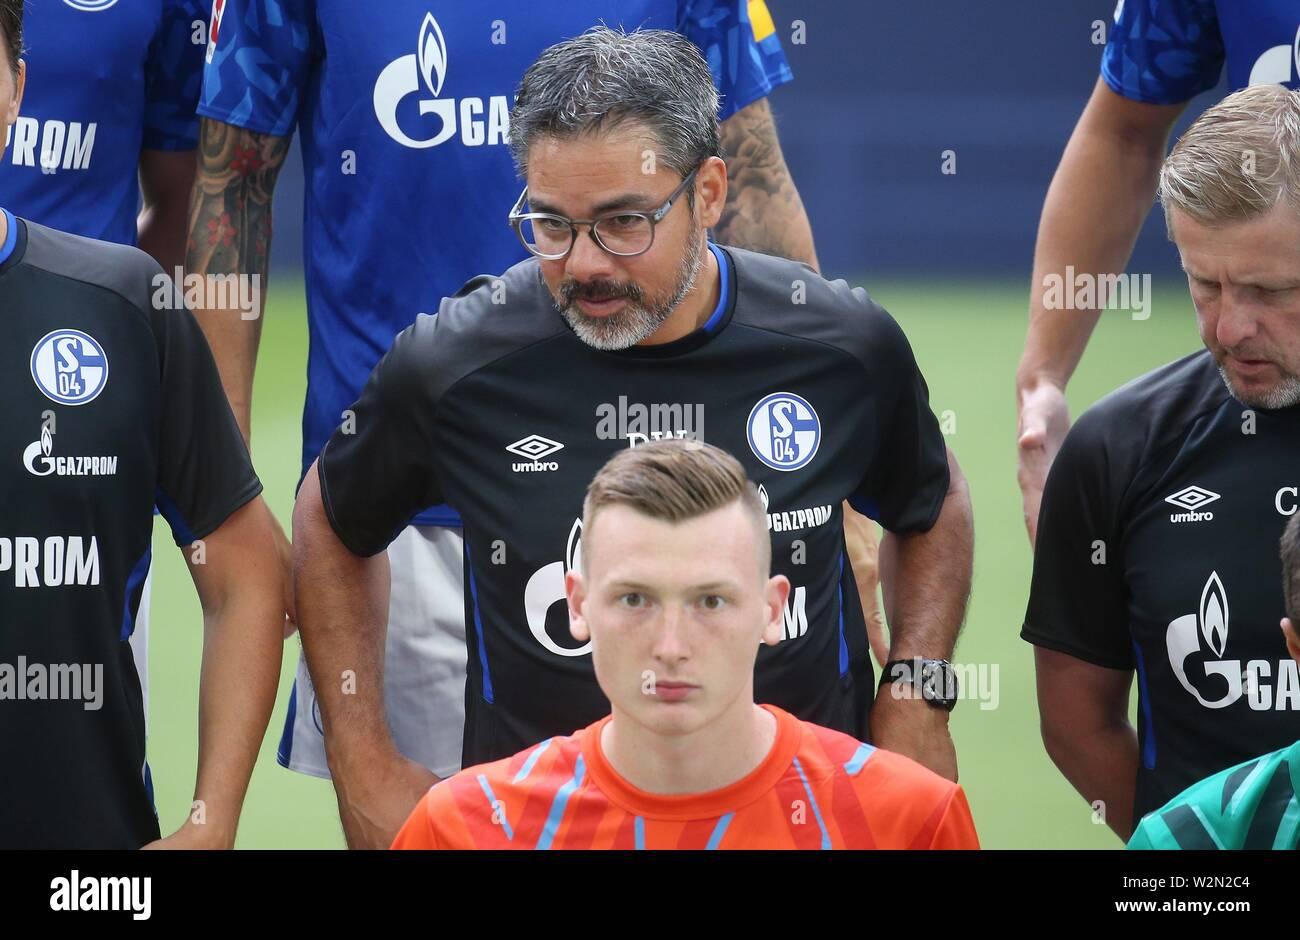 firo: 10.07.2019 football, 2019/2020 FC Schalke 04, photo session, photo session coach David Wagner front MArkus Schubert   usage worldwide - Stock Image